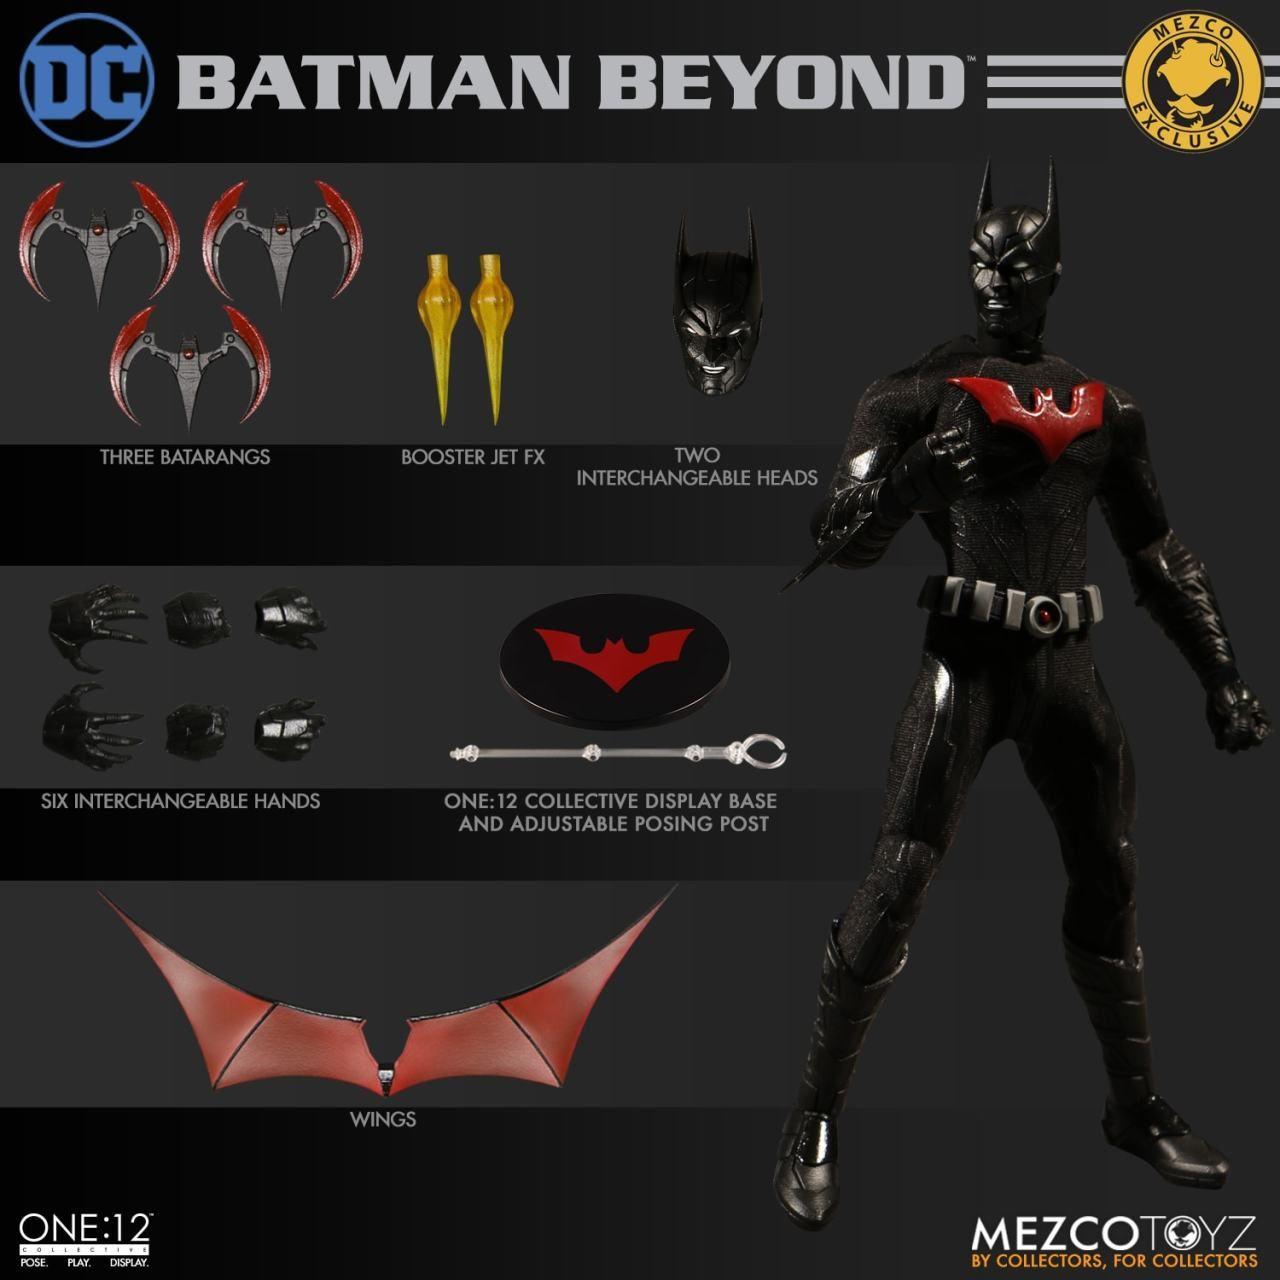 Sovereign Knight Figure In Hand! Mezco Toyz 1//12 One 12 Collective DC Batman